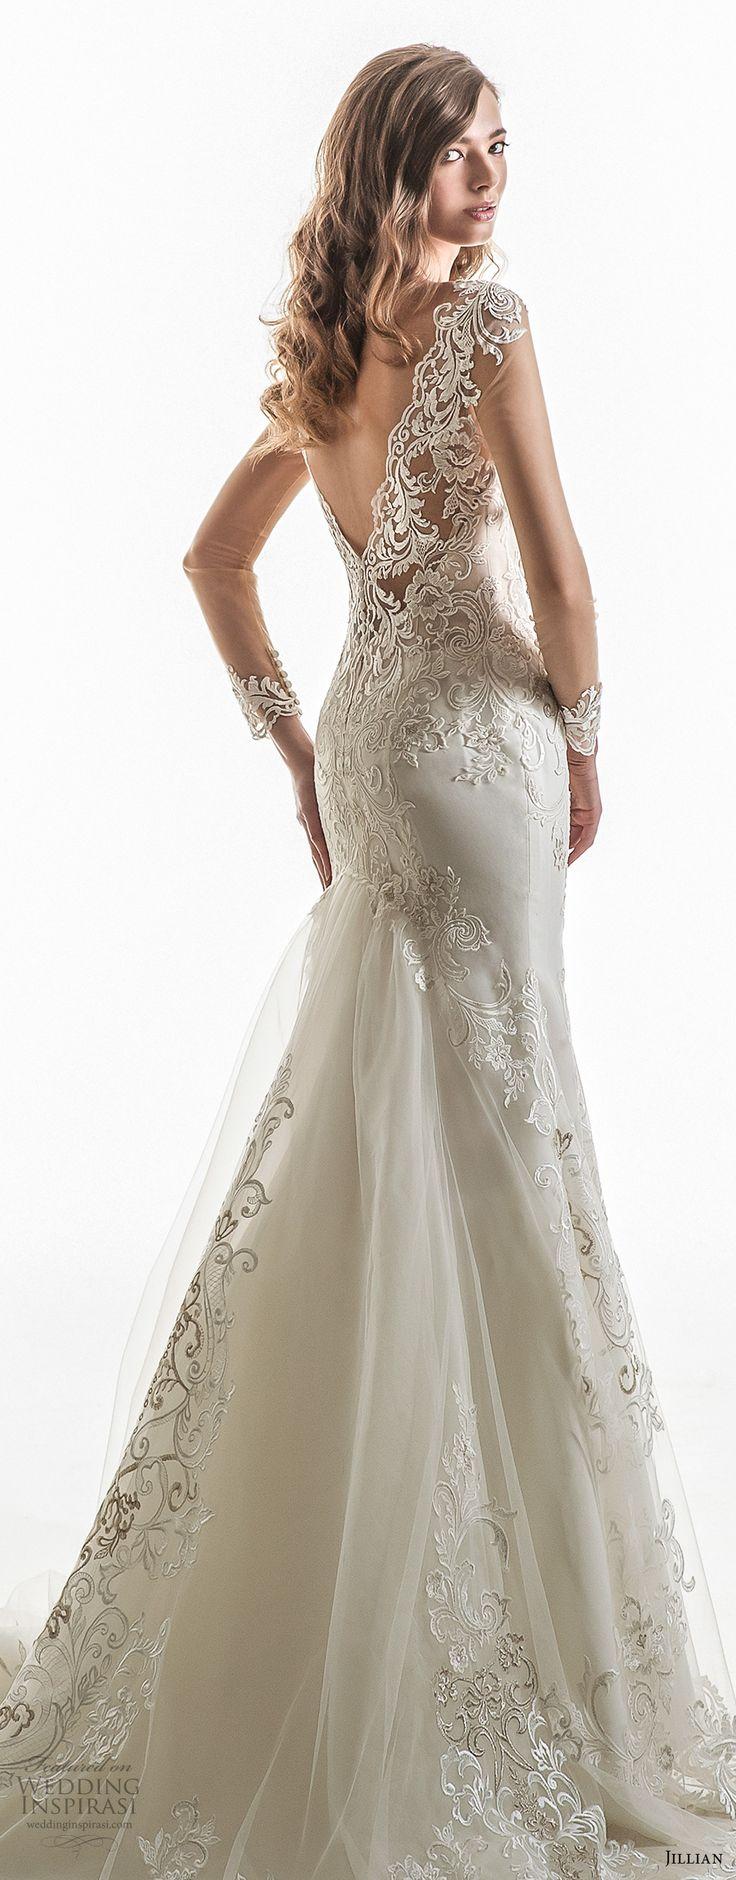 jillian 2018 bridal cap sleeves sweetheart neckline heavily embellished bodice elegant sheath wedding dress open v back chapel train (03) zbv -- Jillian 2018 Wedding Dresses